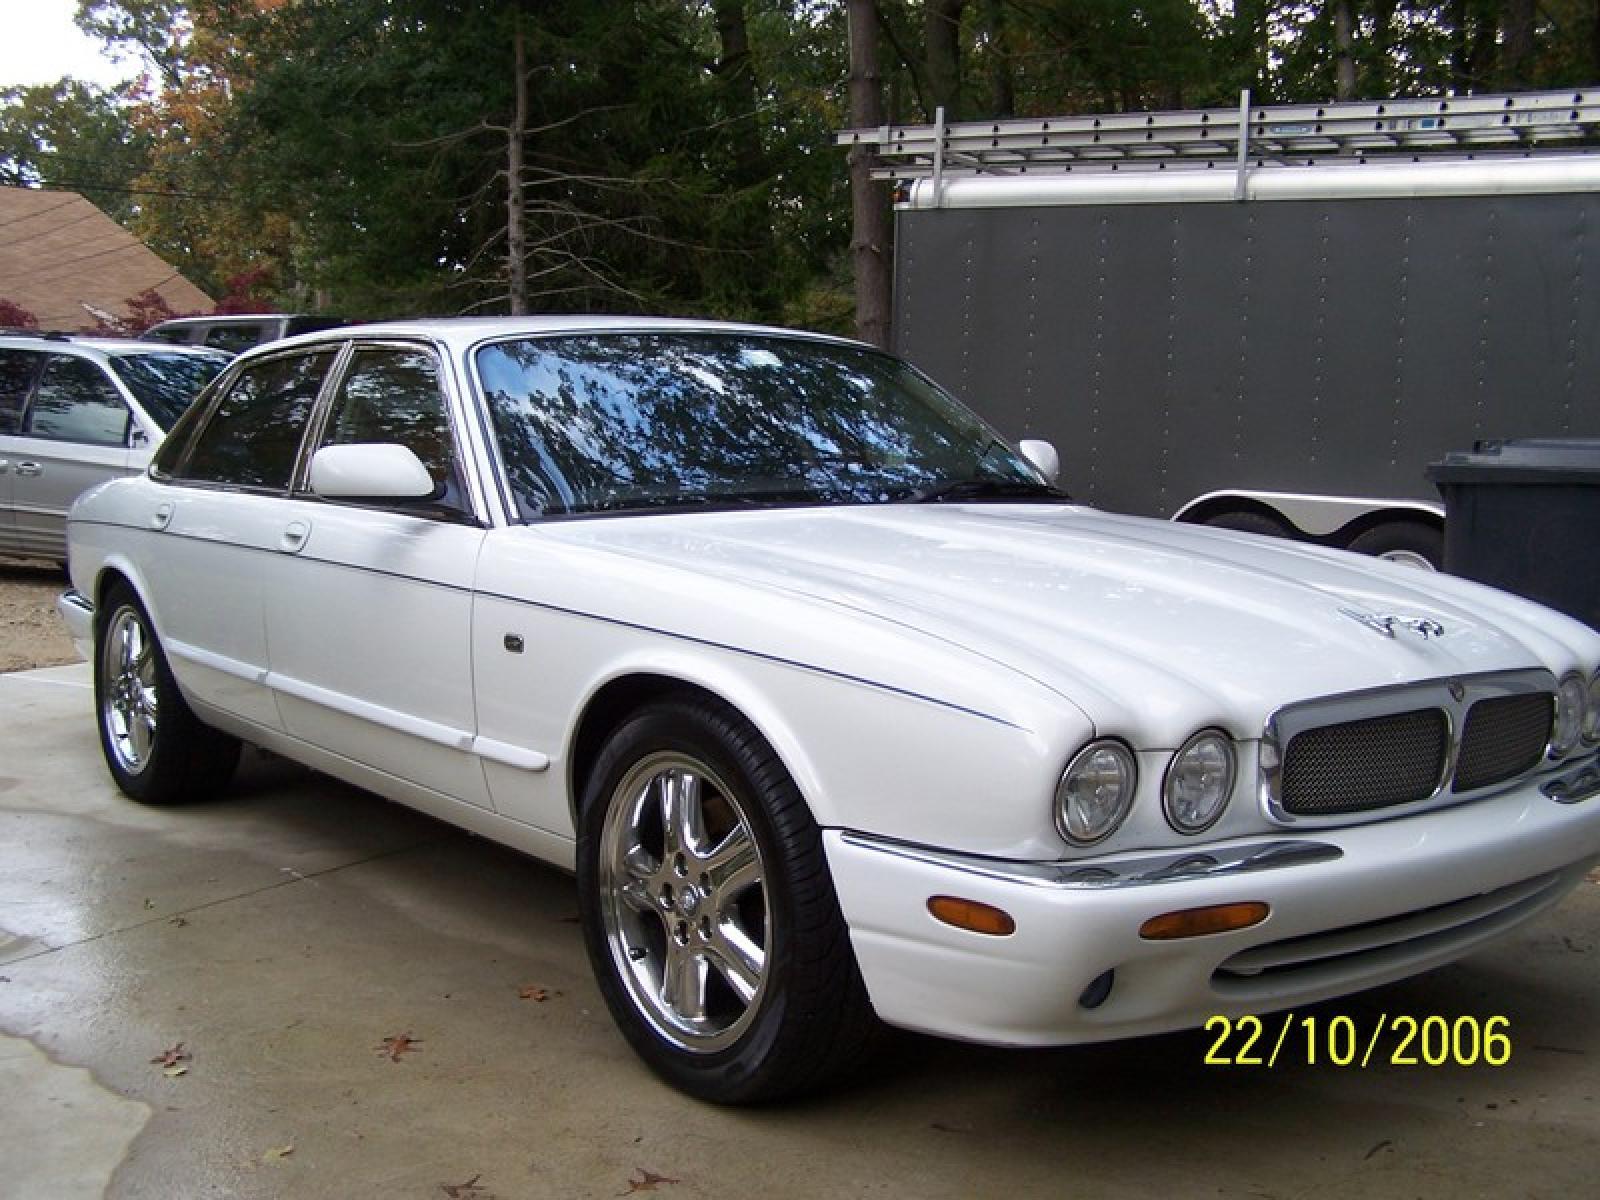 800 1024 1280 1600 origin 1999 jaguar xjr